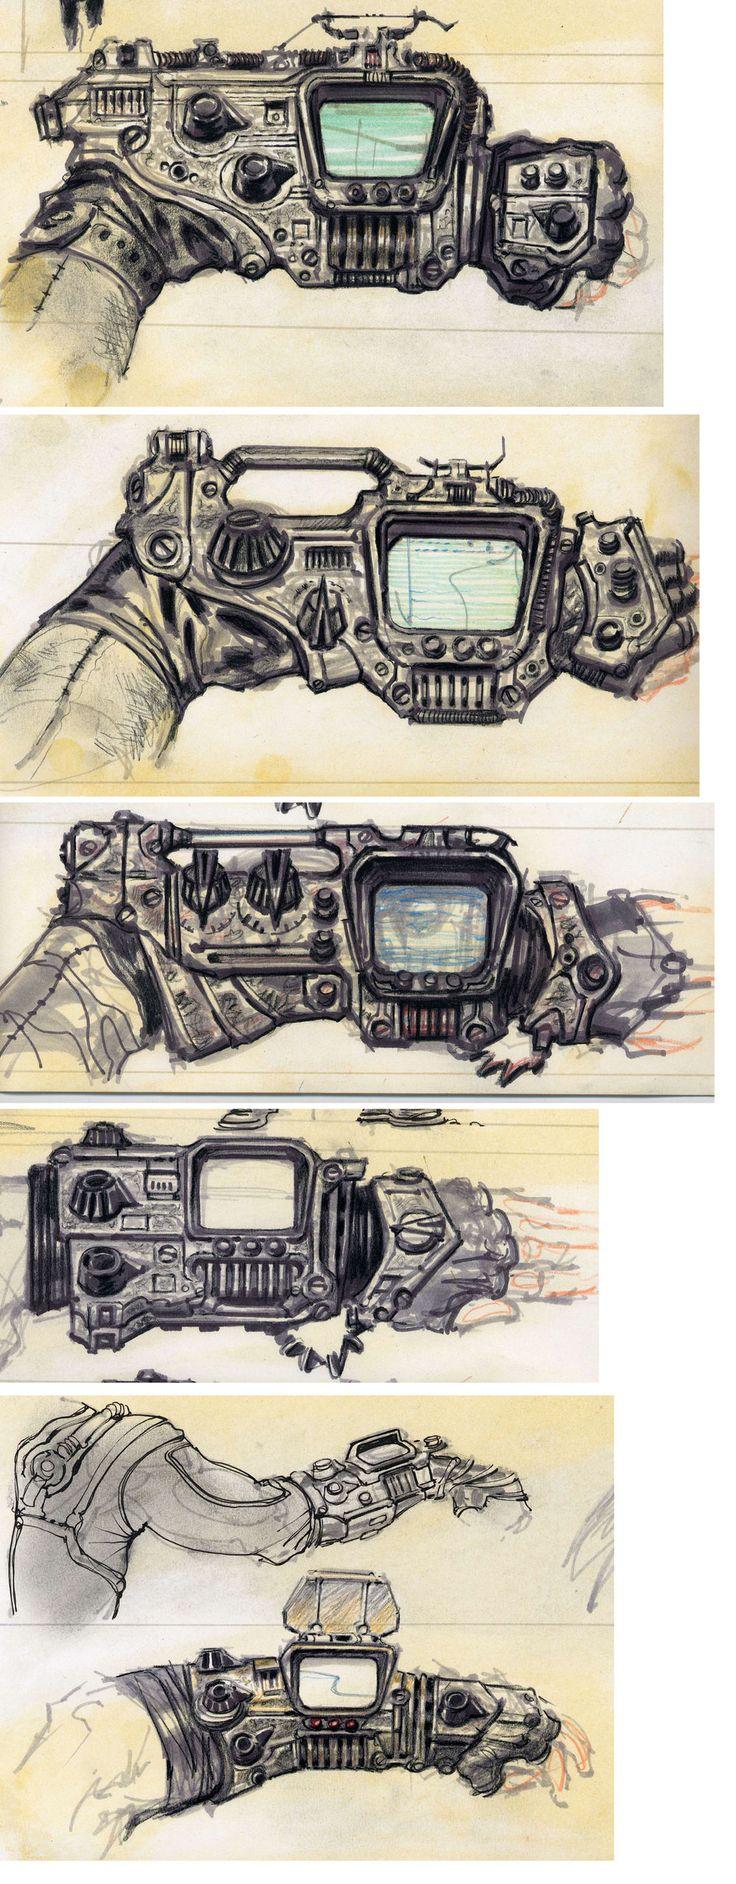 Fallout 3 miscellaneous items concept art